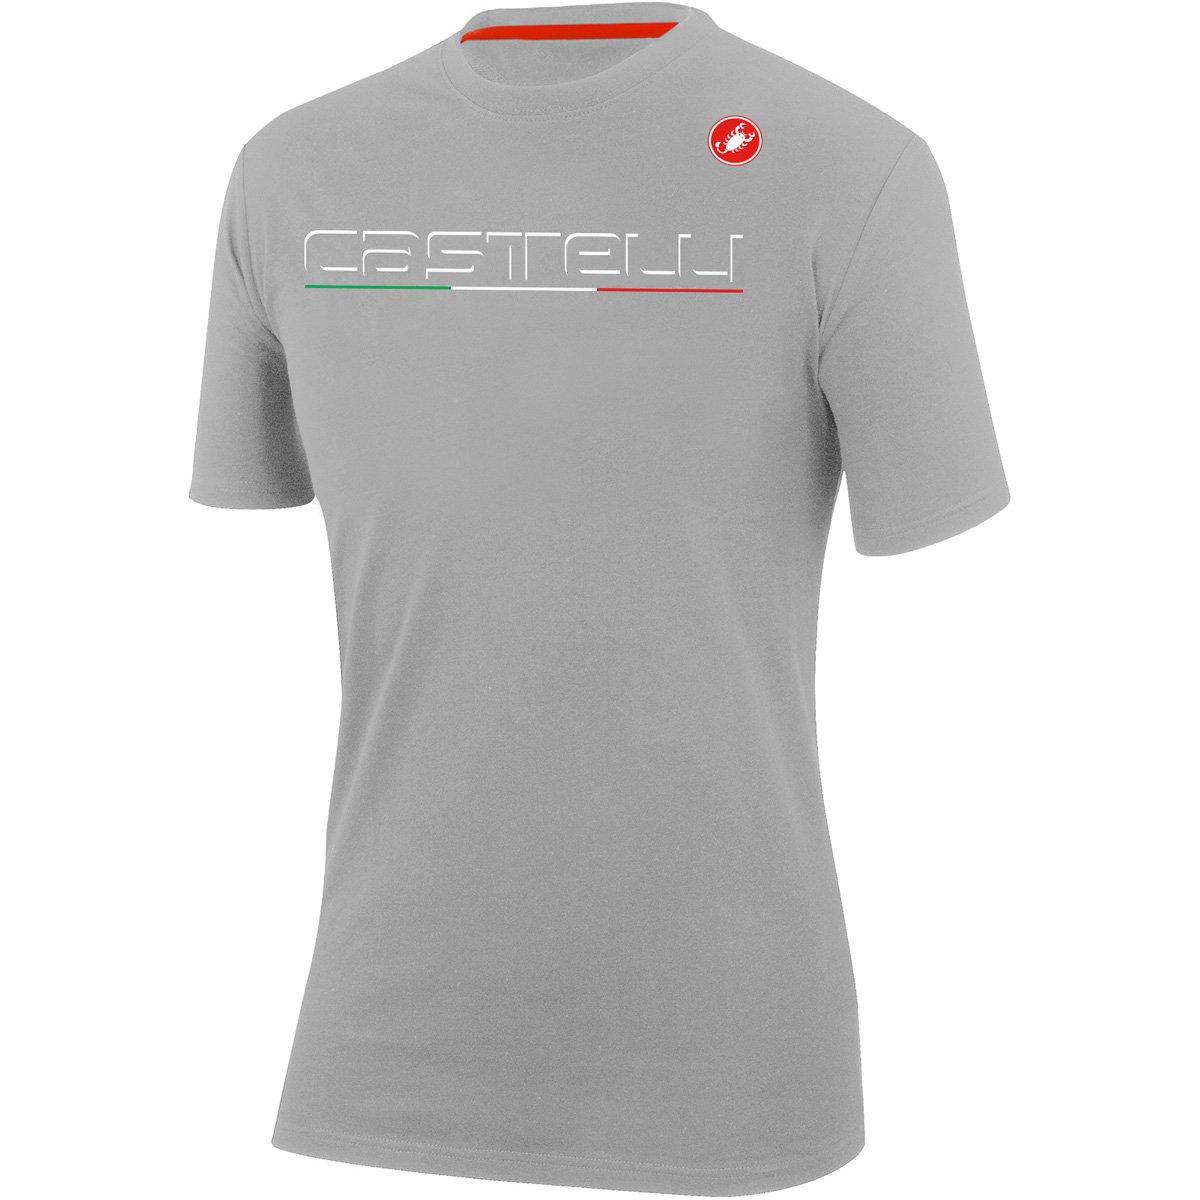 CastelliクラシックTシャツ B079NLM61Z X-Large|Melange Light Gray Melange Light Gray X-Large